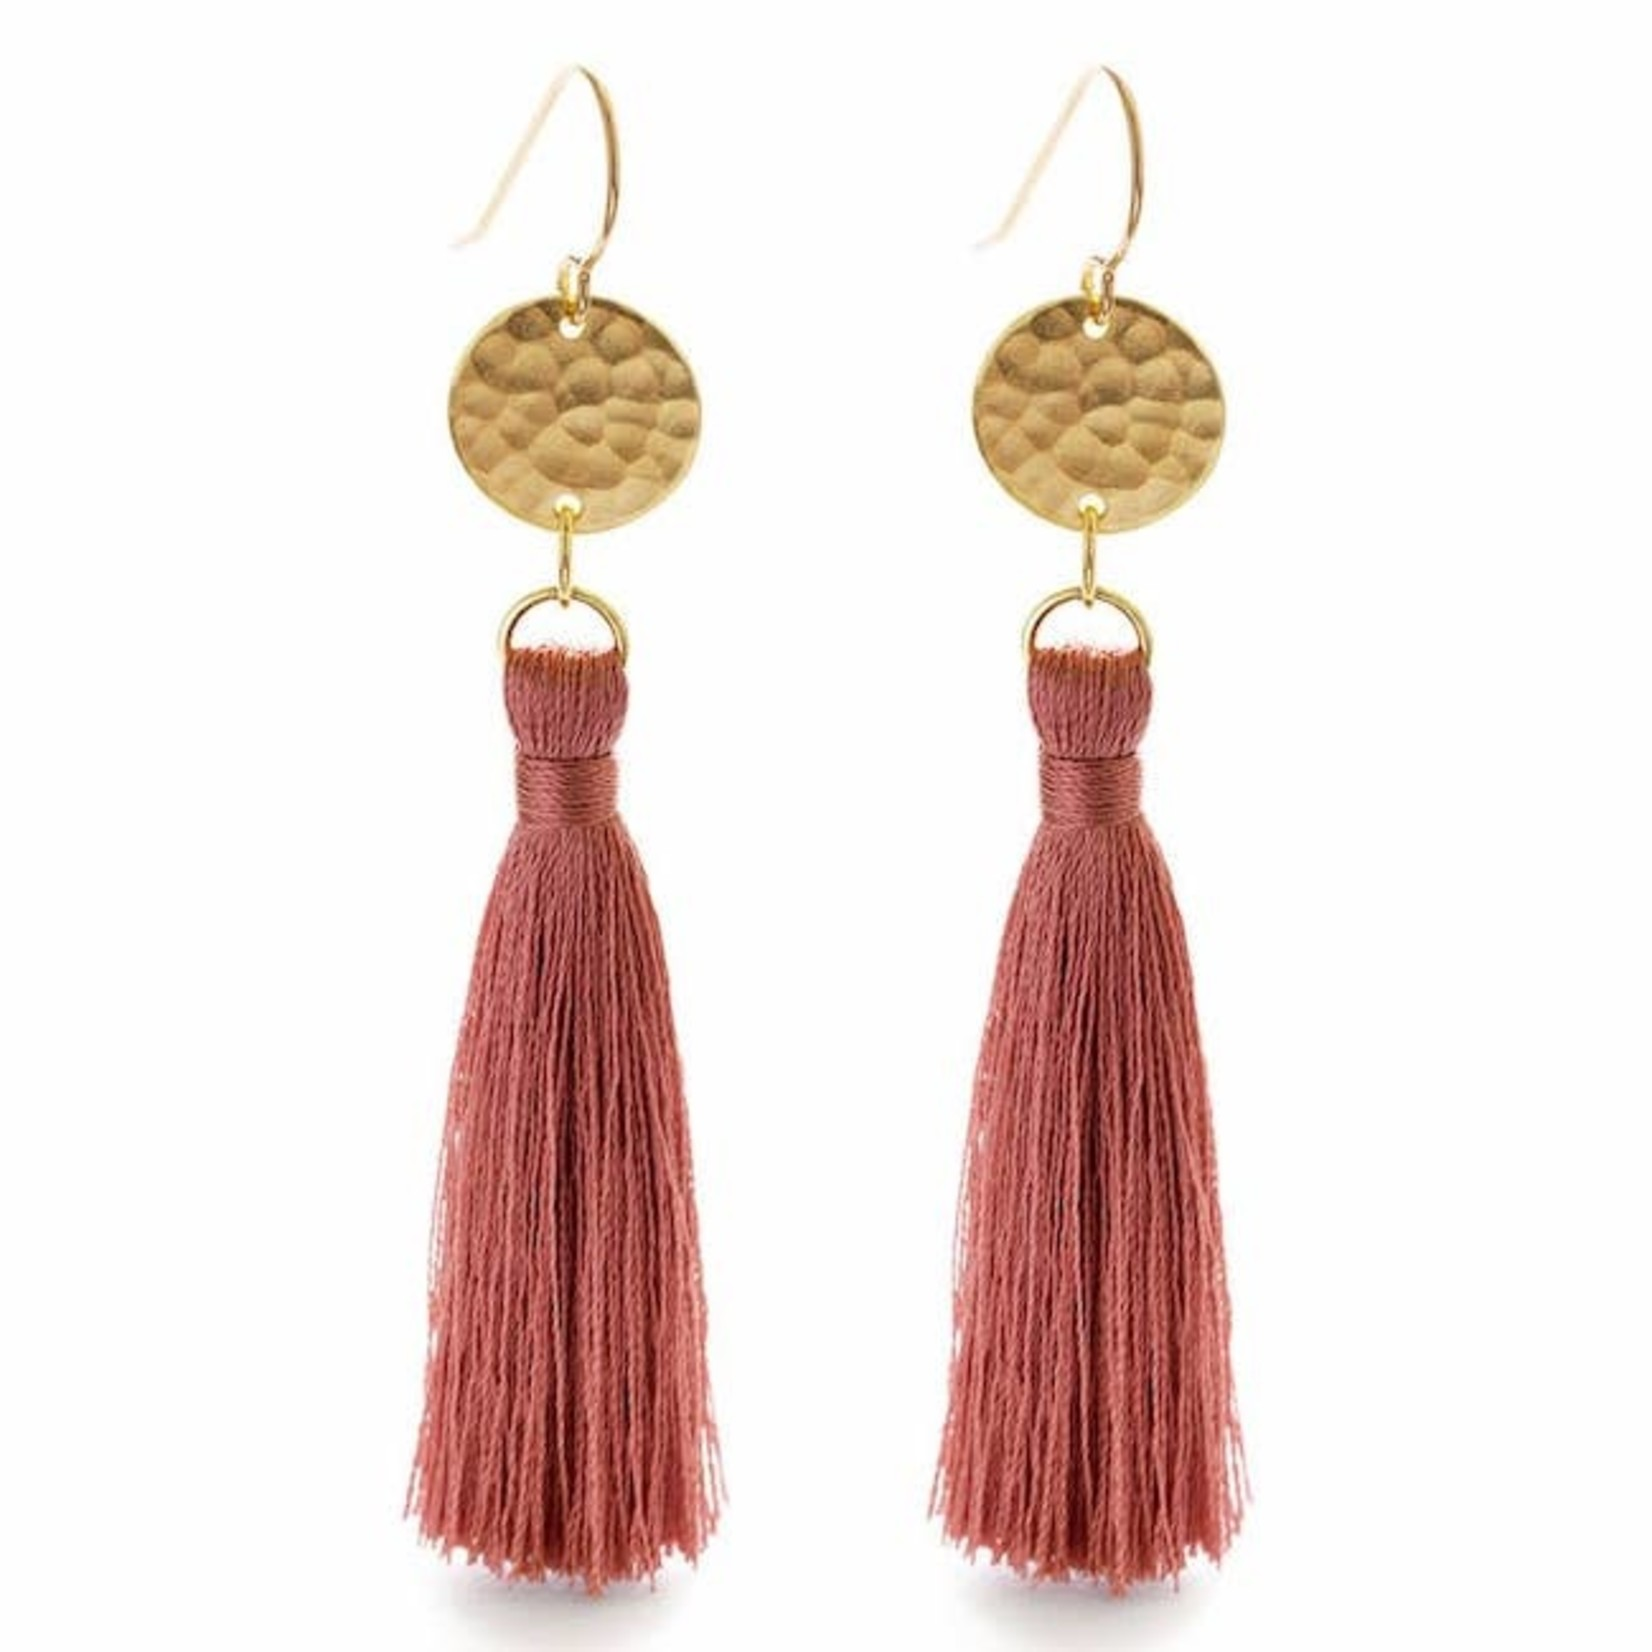 Indigo Faire Tassel Earrings